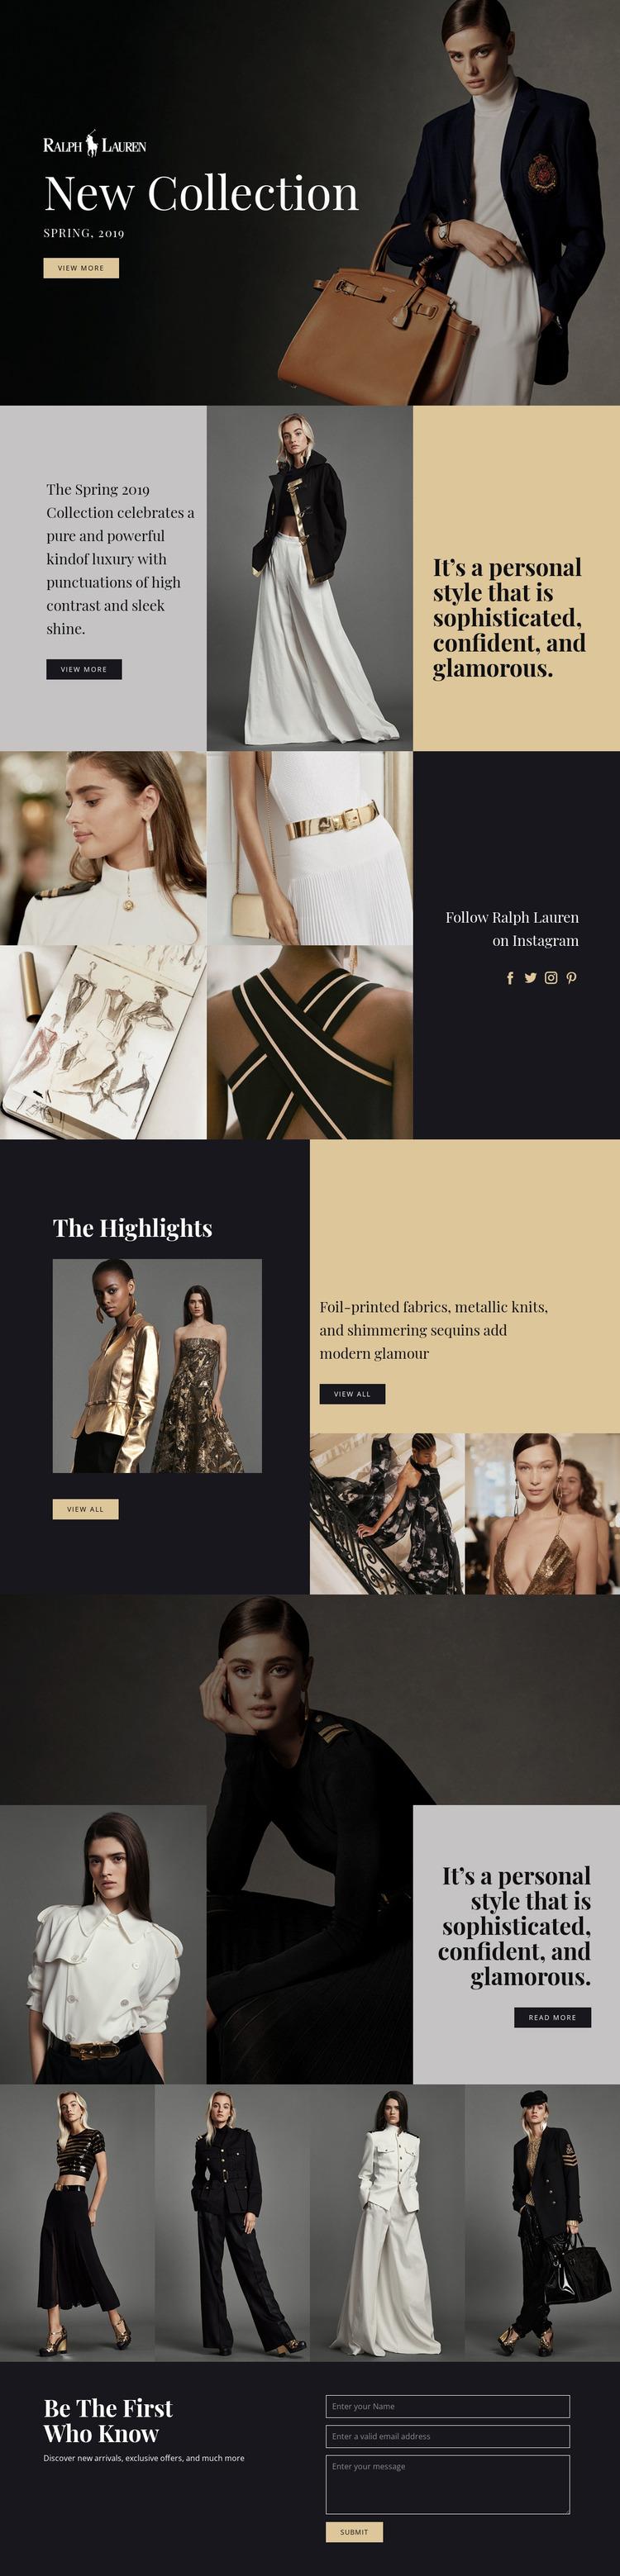 Ralph Lauren fashion Website Mockup